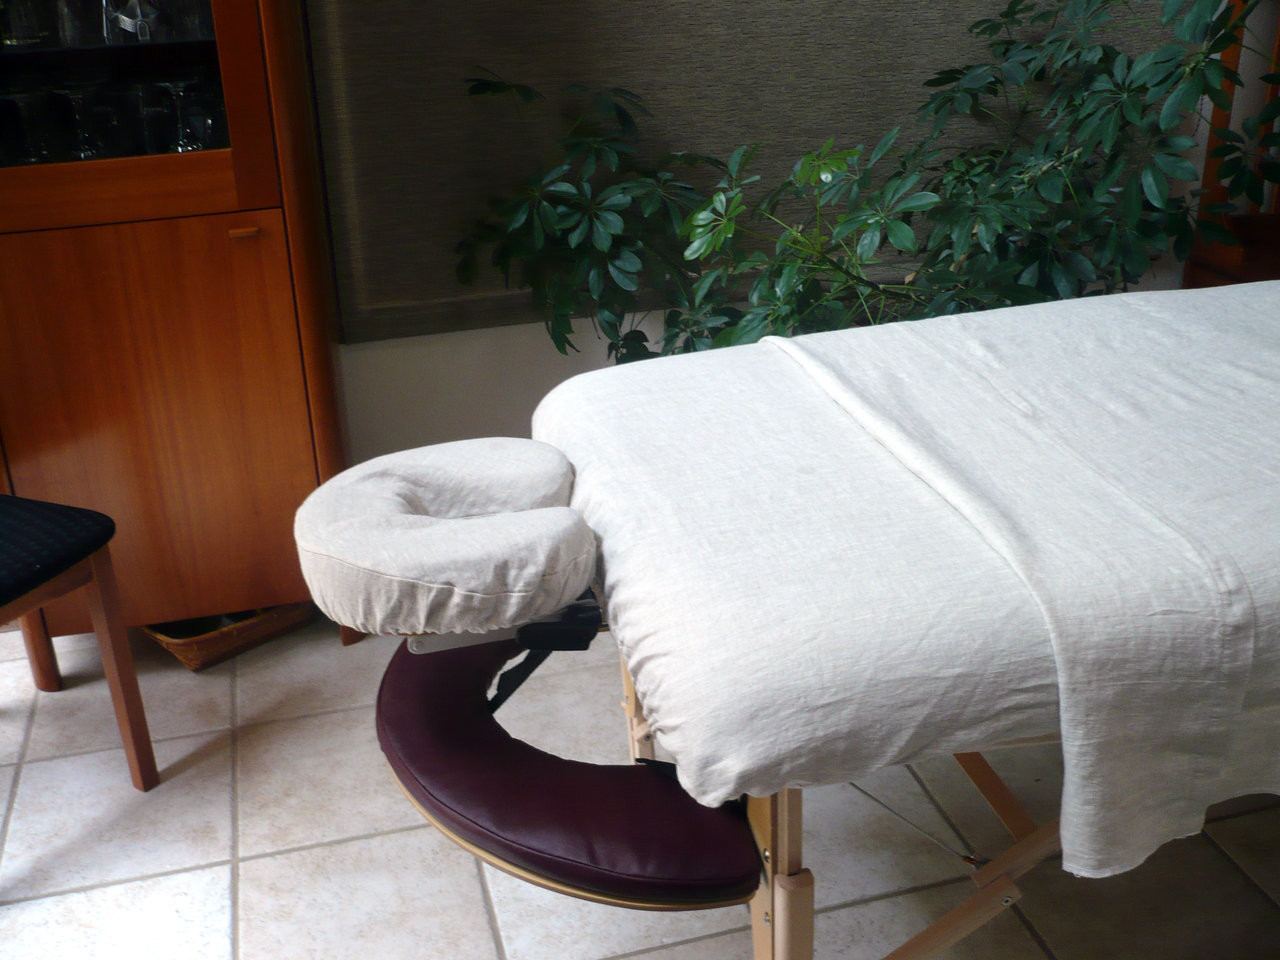 Health Shields - Massage Table sheet sets & Health Shields - Massage Table Sheets ($54-$155)